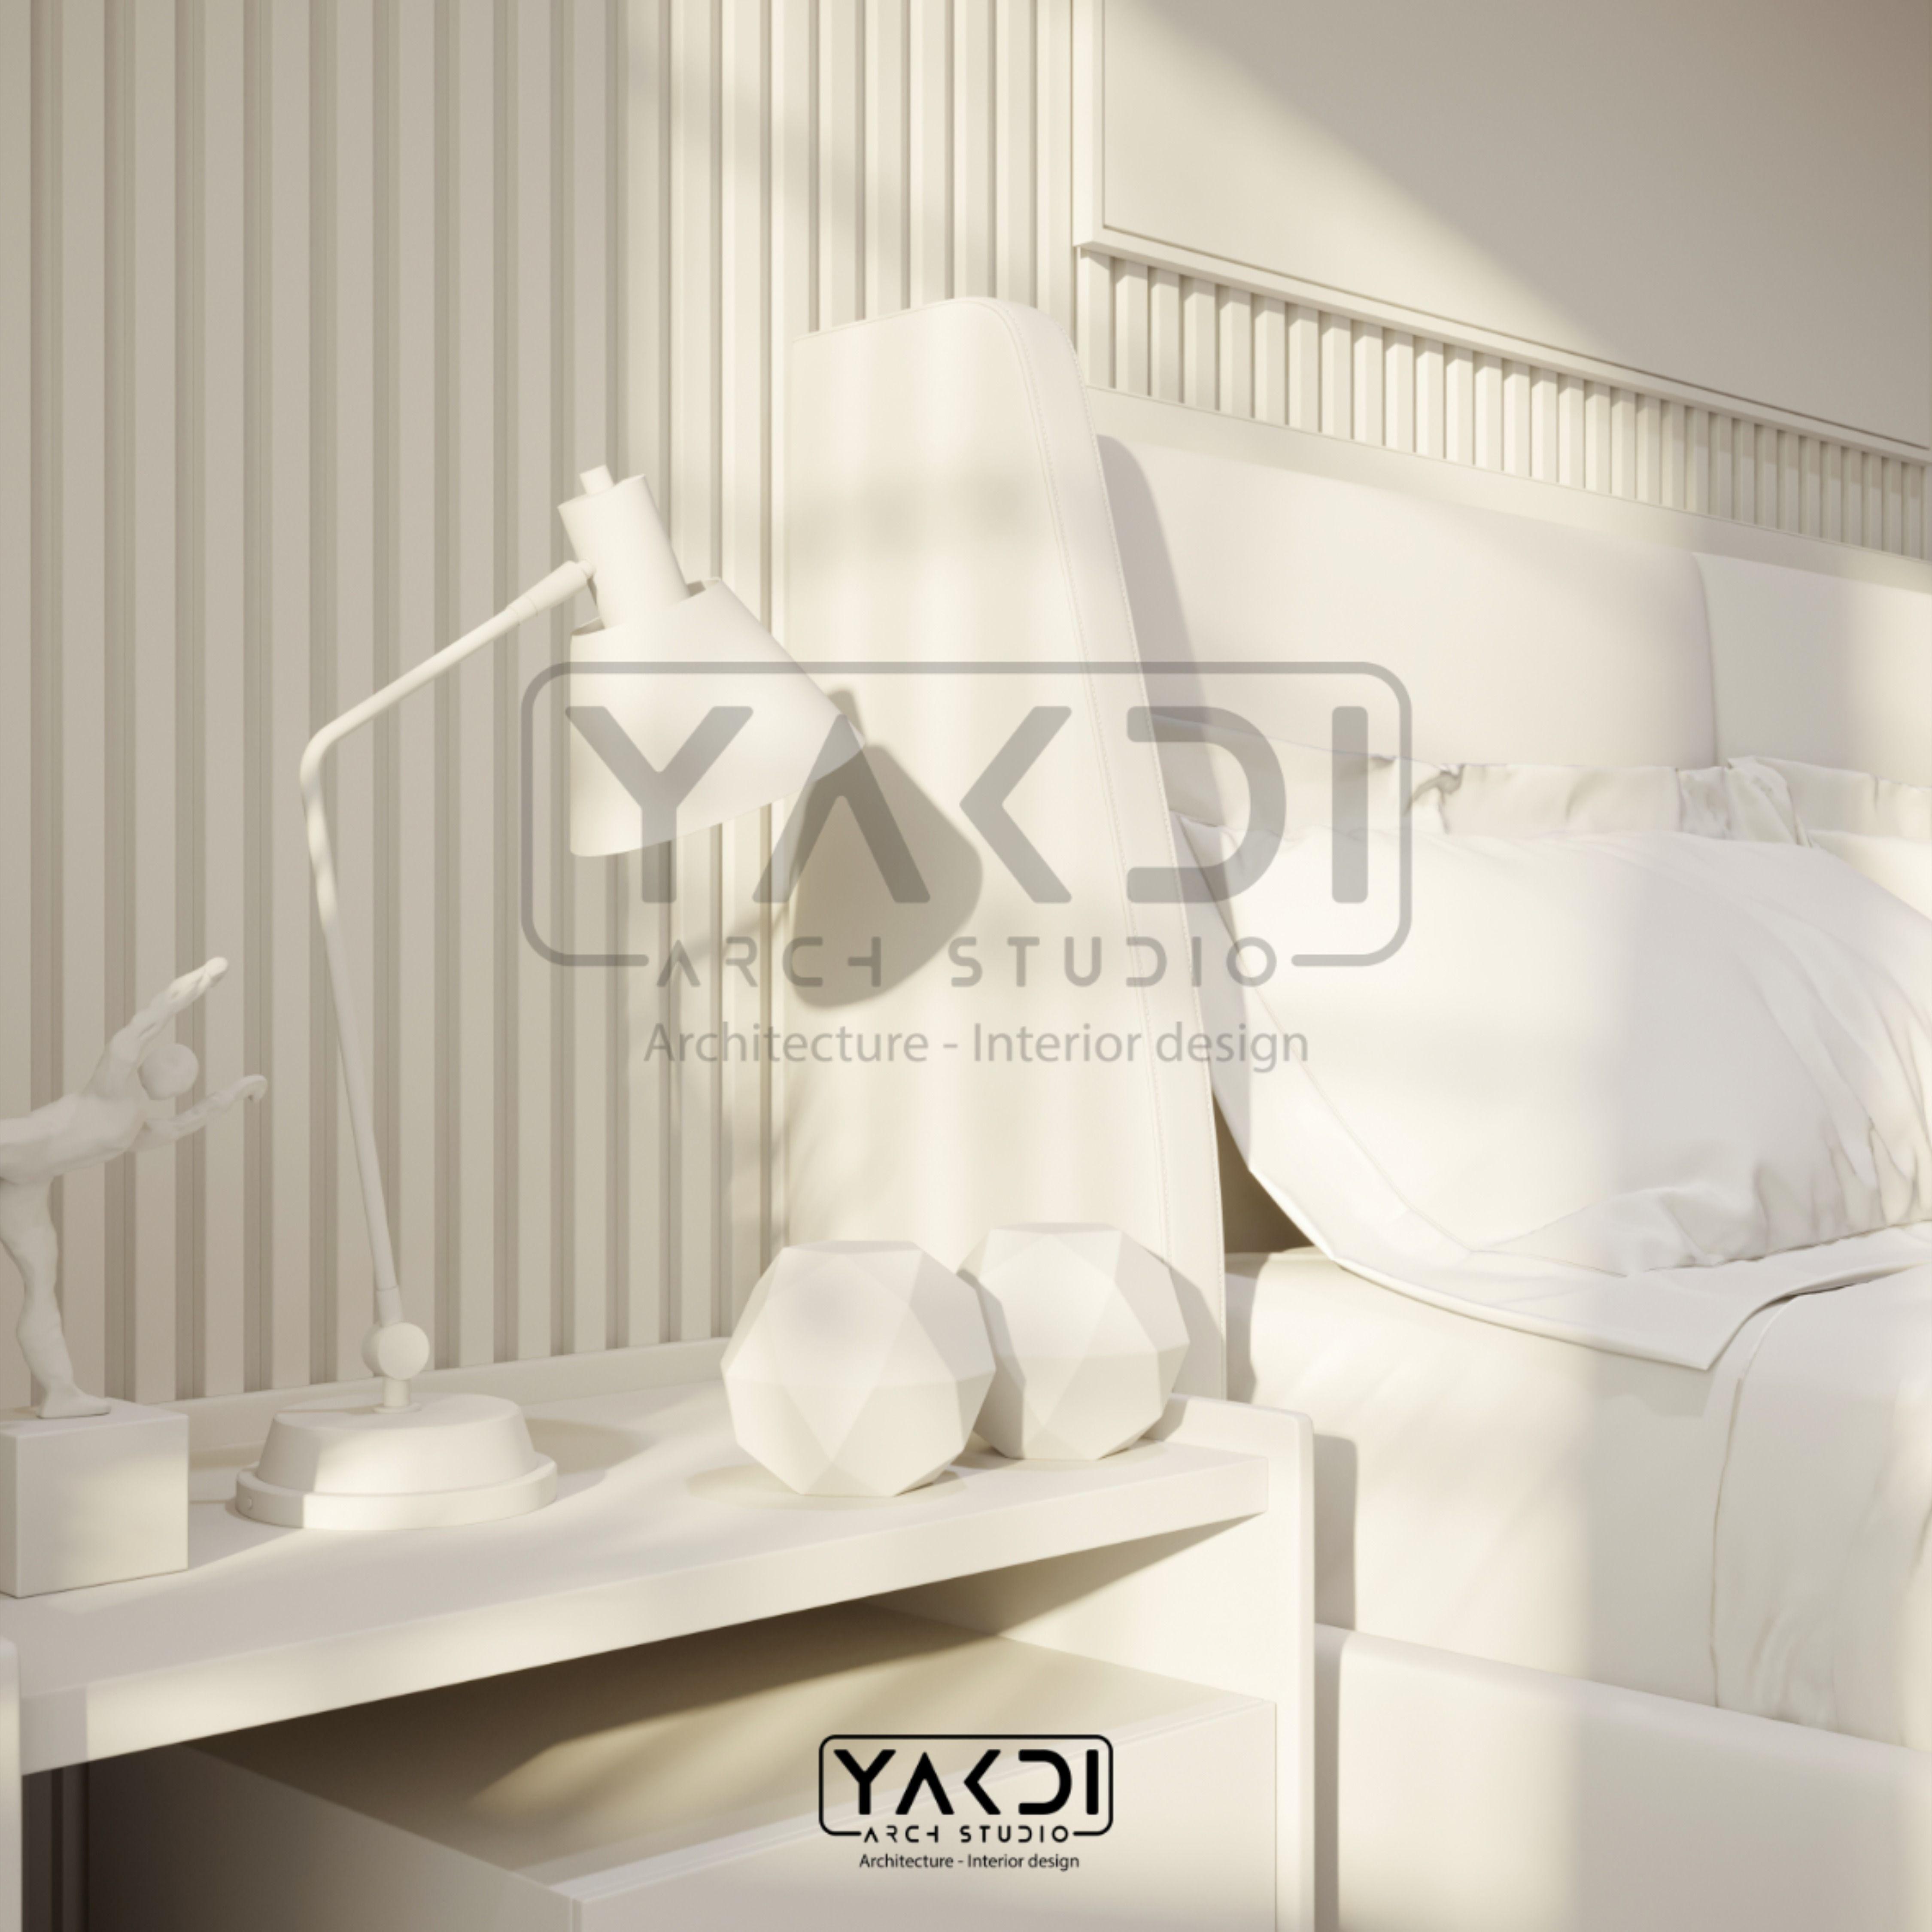 Master Bedroom غرفة نوم In 2020 Apartment Lighting Interior Architecture Design Modern Apartment